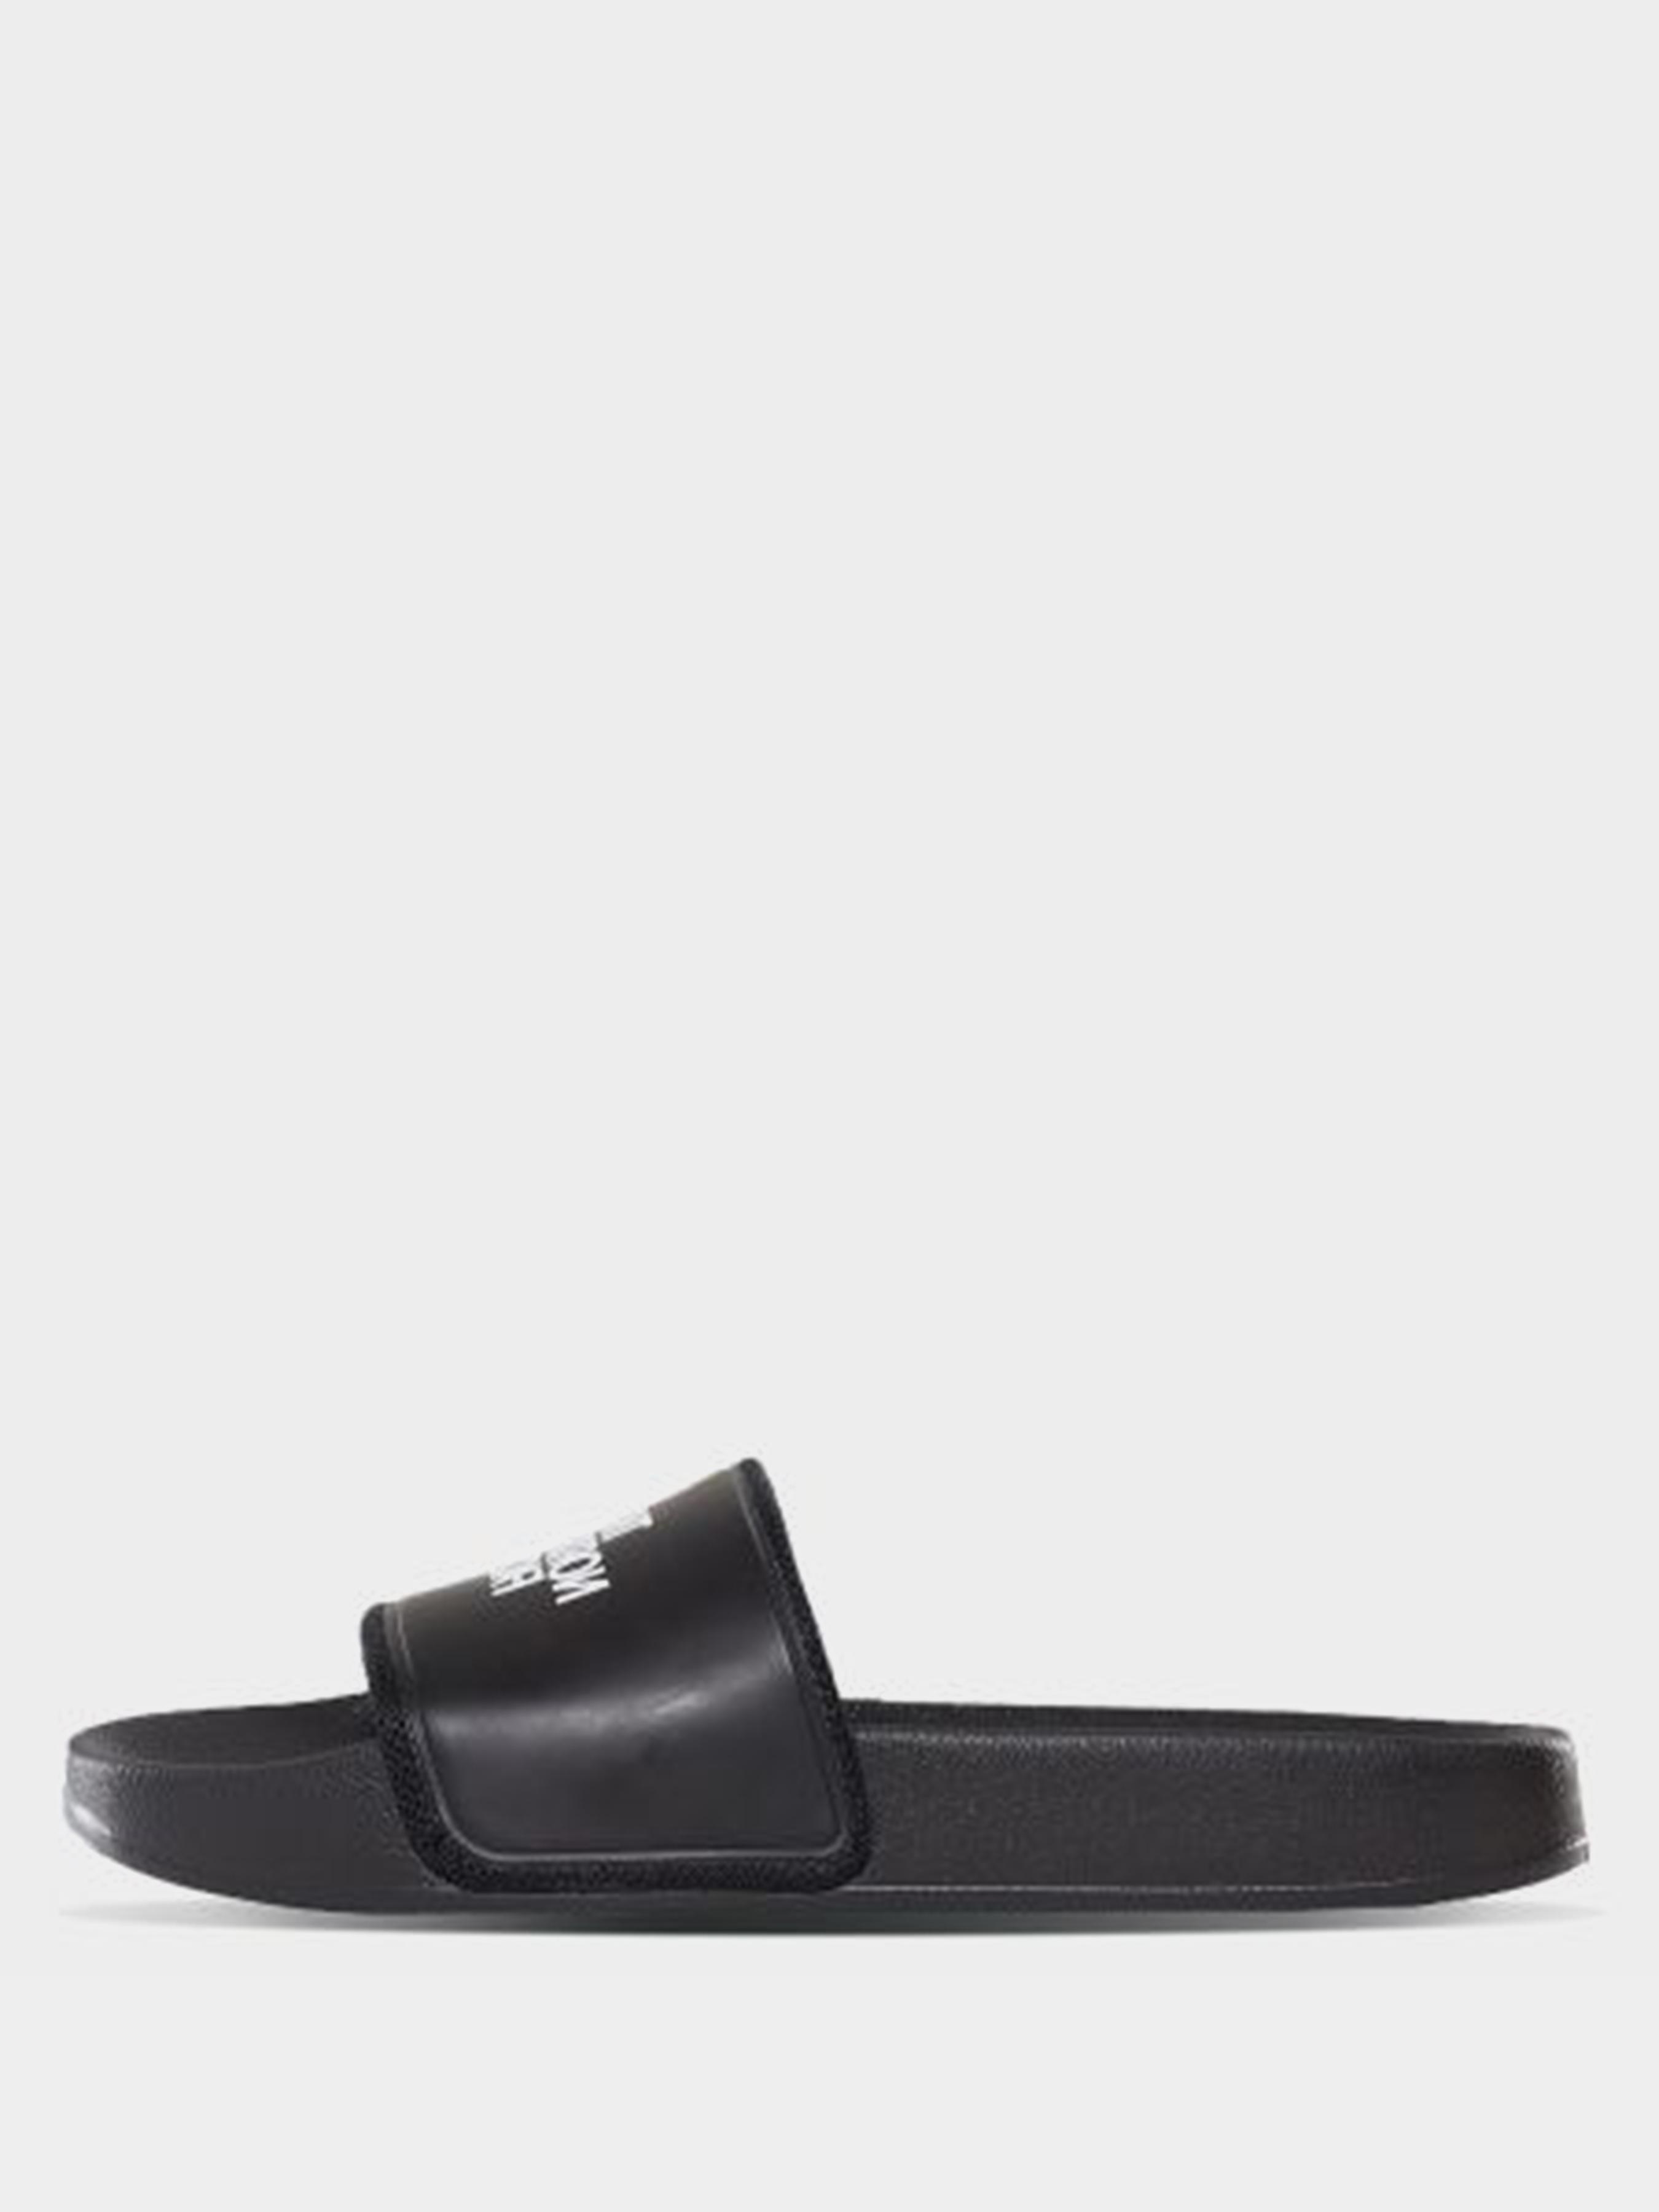 Шлёпанцы для мужчин The North Face BC SLIDE II NT88 цена обуви, 2017